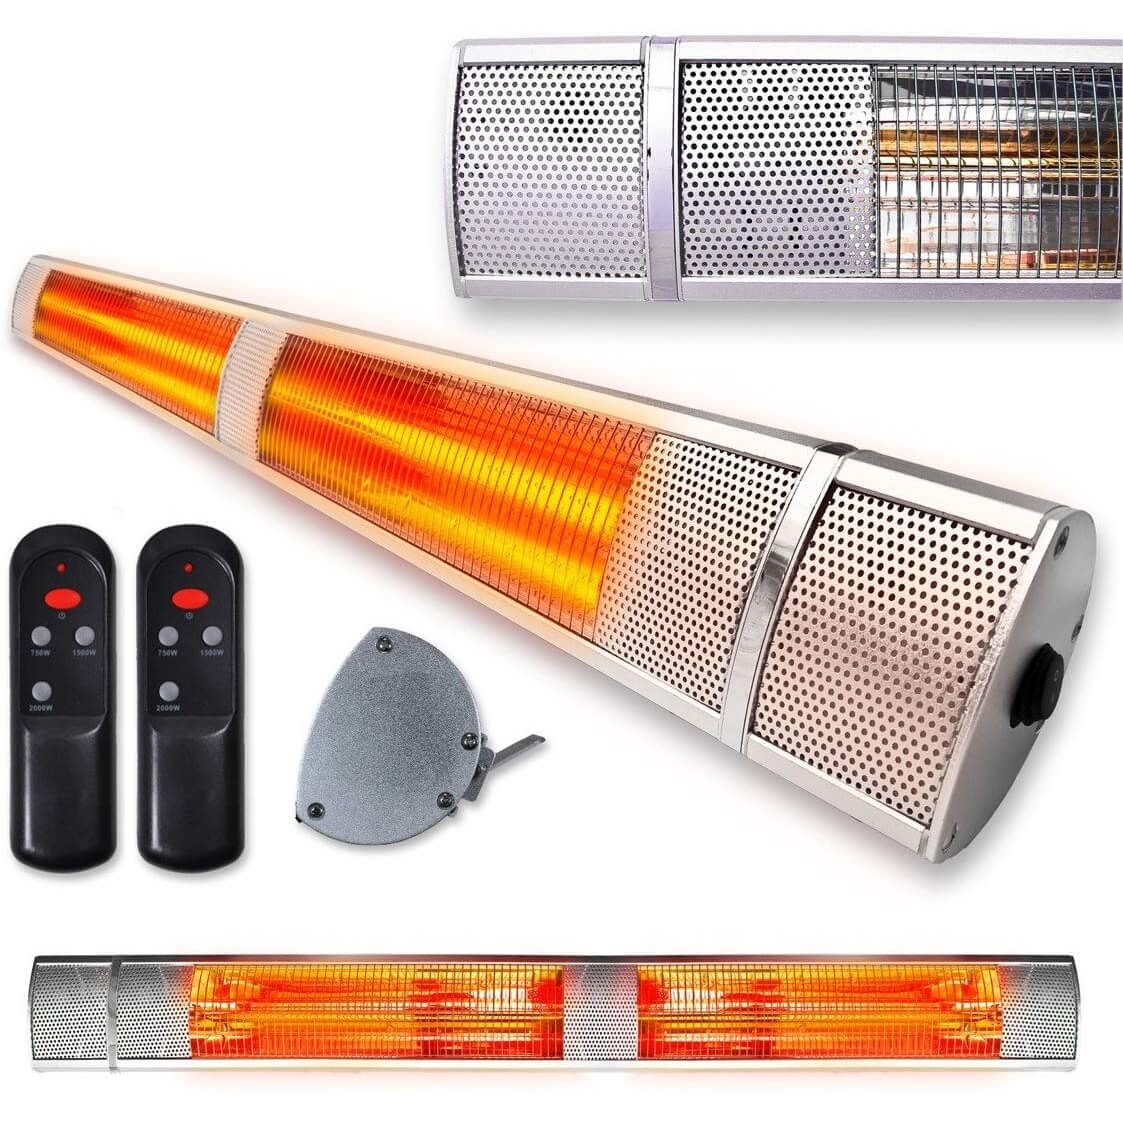 Bathroom Heater Radiant Heaters, Infrared Wall Heaters Bathroom